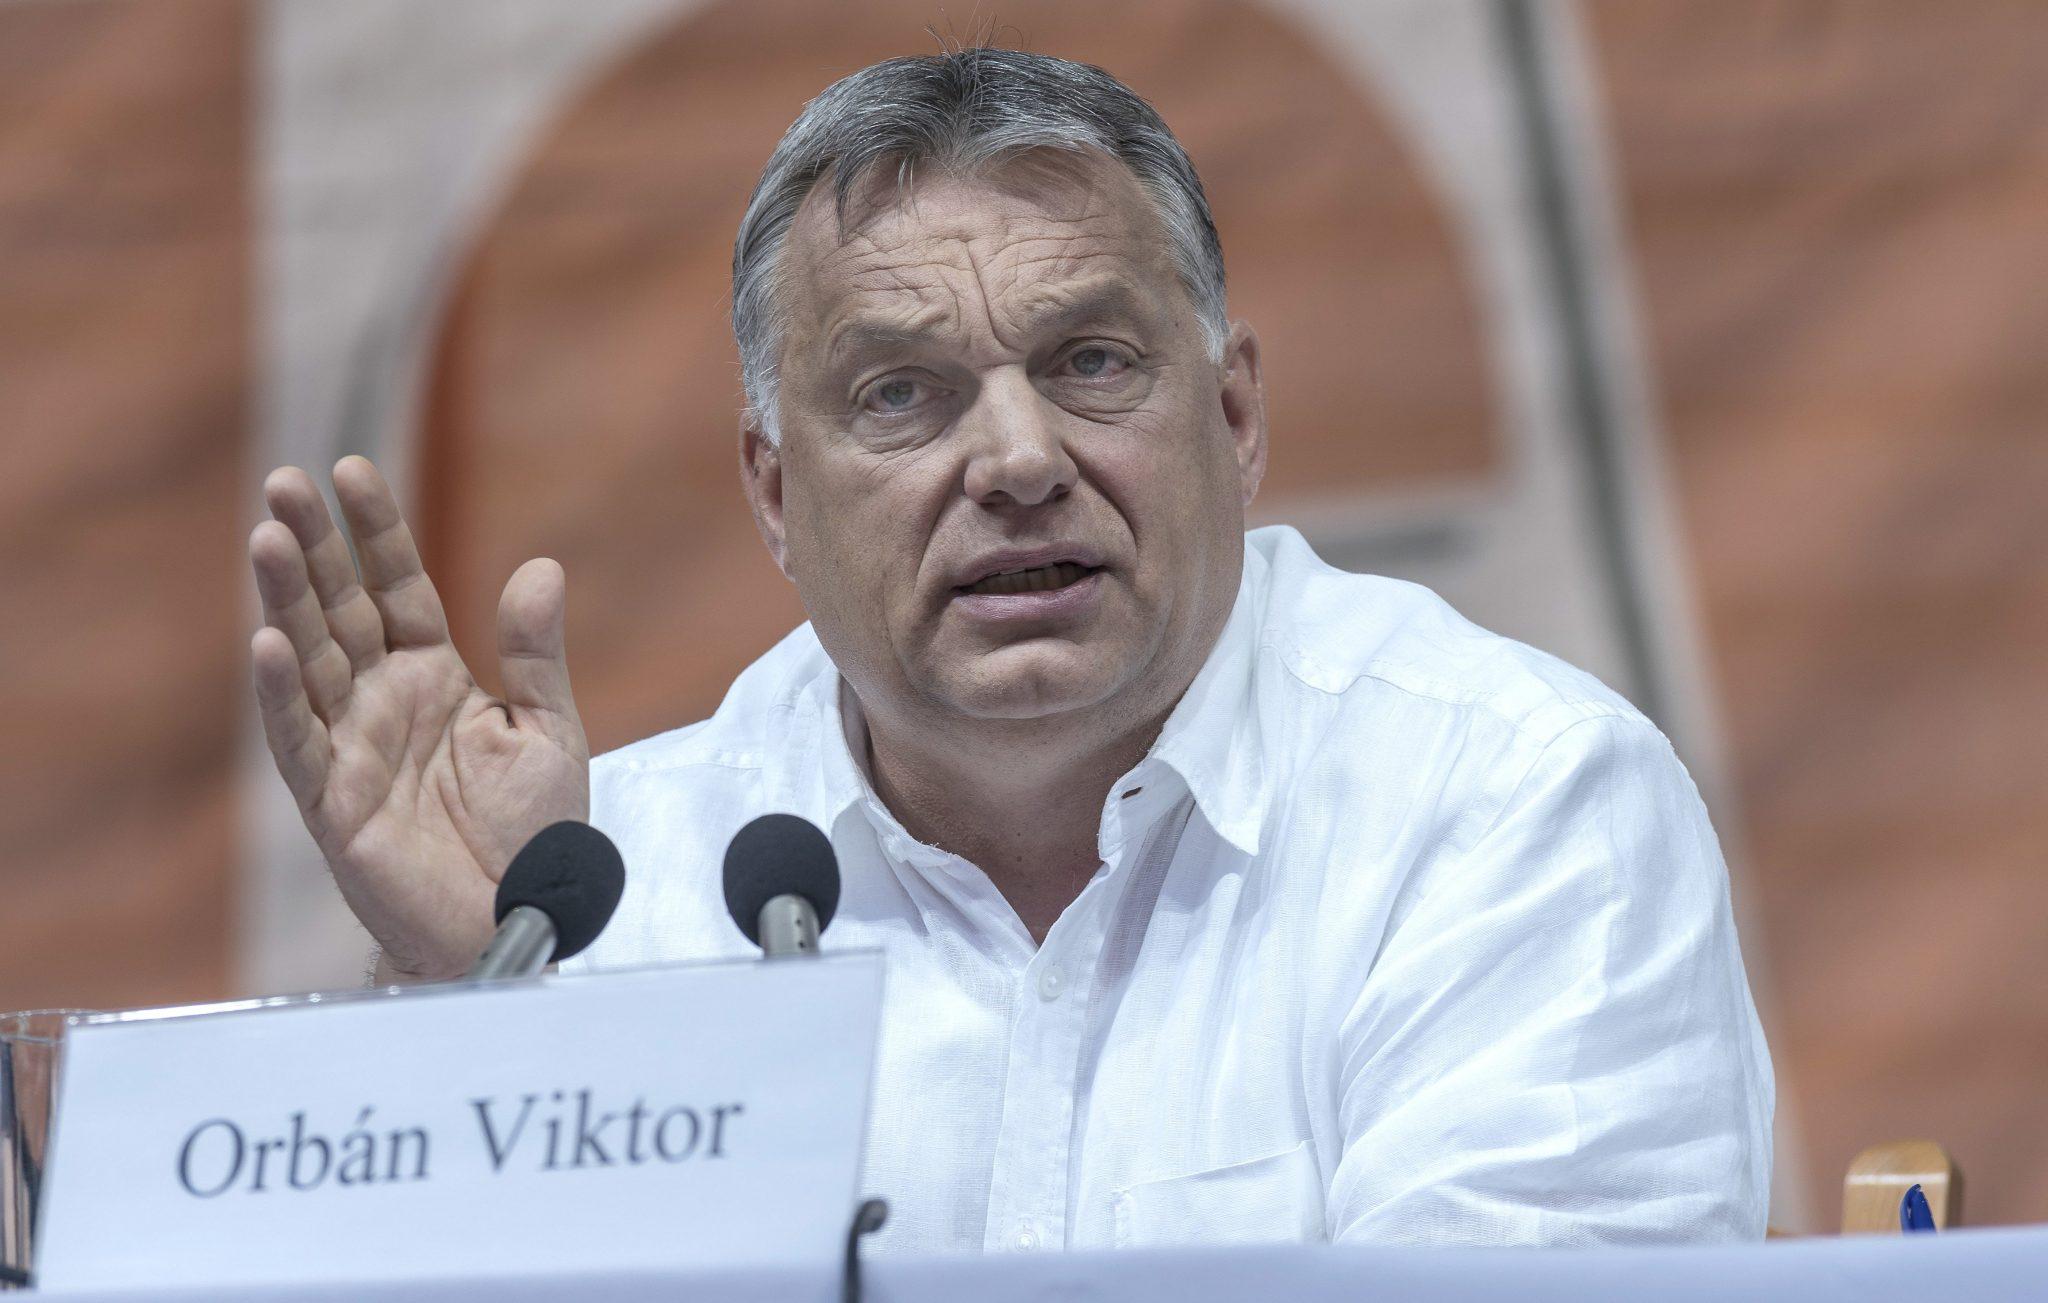 PM ORbán Romania Tusványos